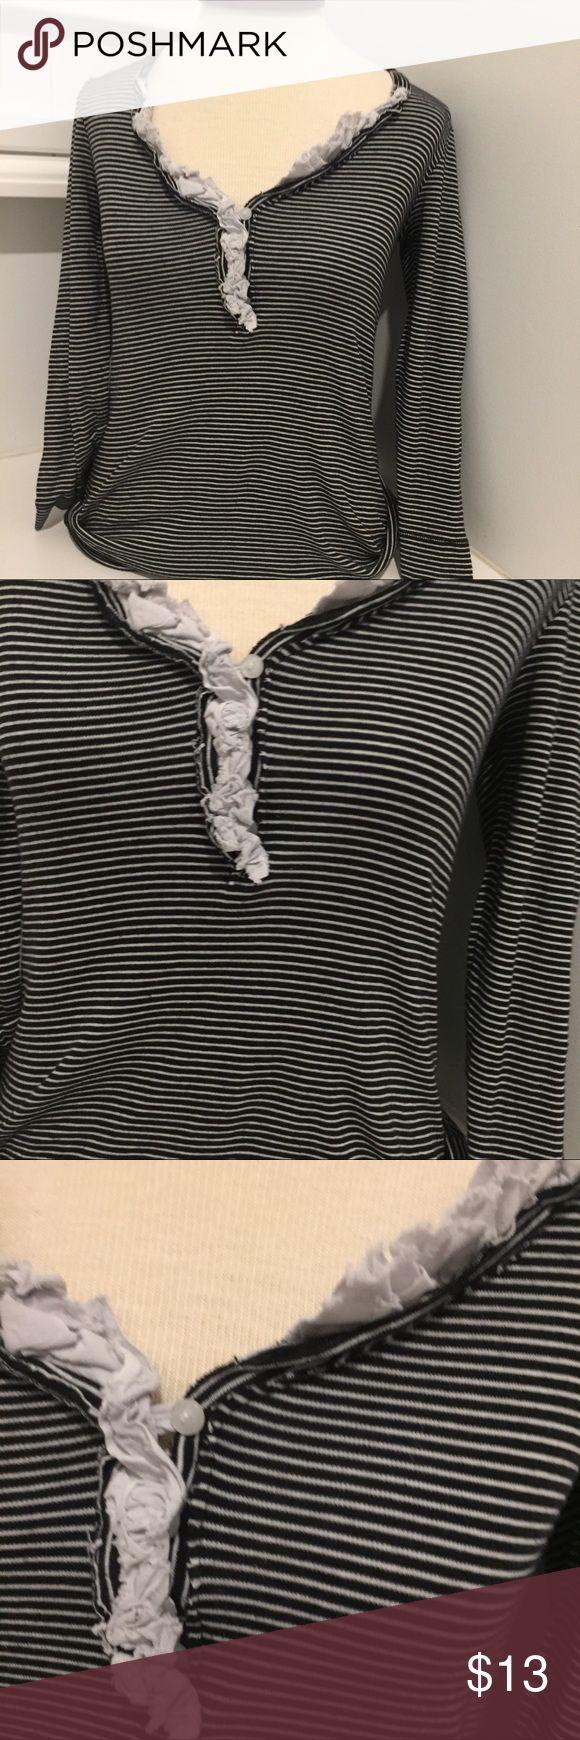 J.CREW Ladies Striped V neck front ruffle xs J.CREW Ladies Striped Split V Neck Mandarin Collar Knit Tee Shirt Top Blouse XS J. Crew Tops Blouses